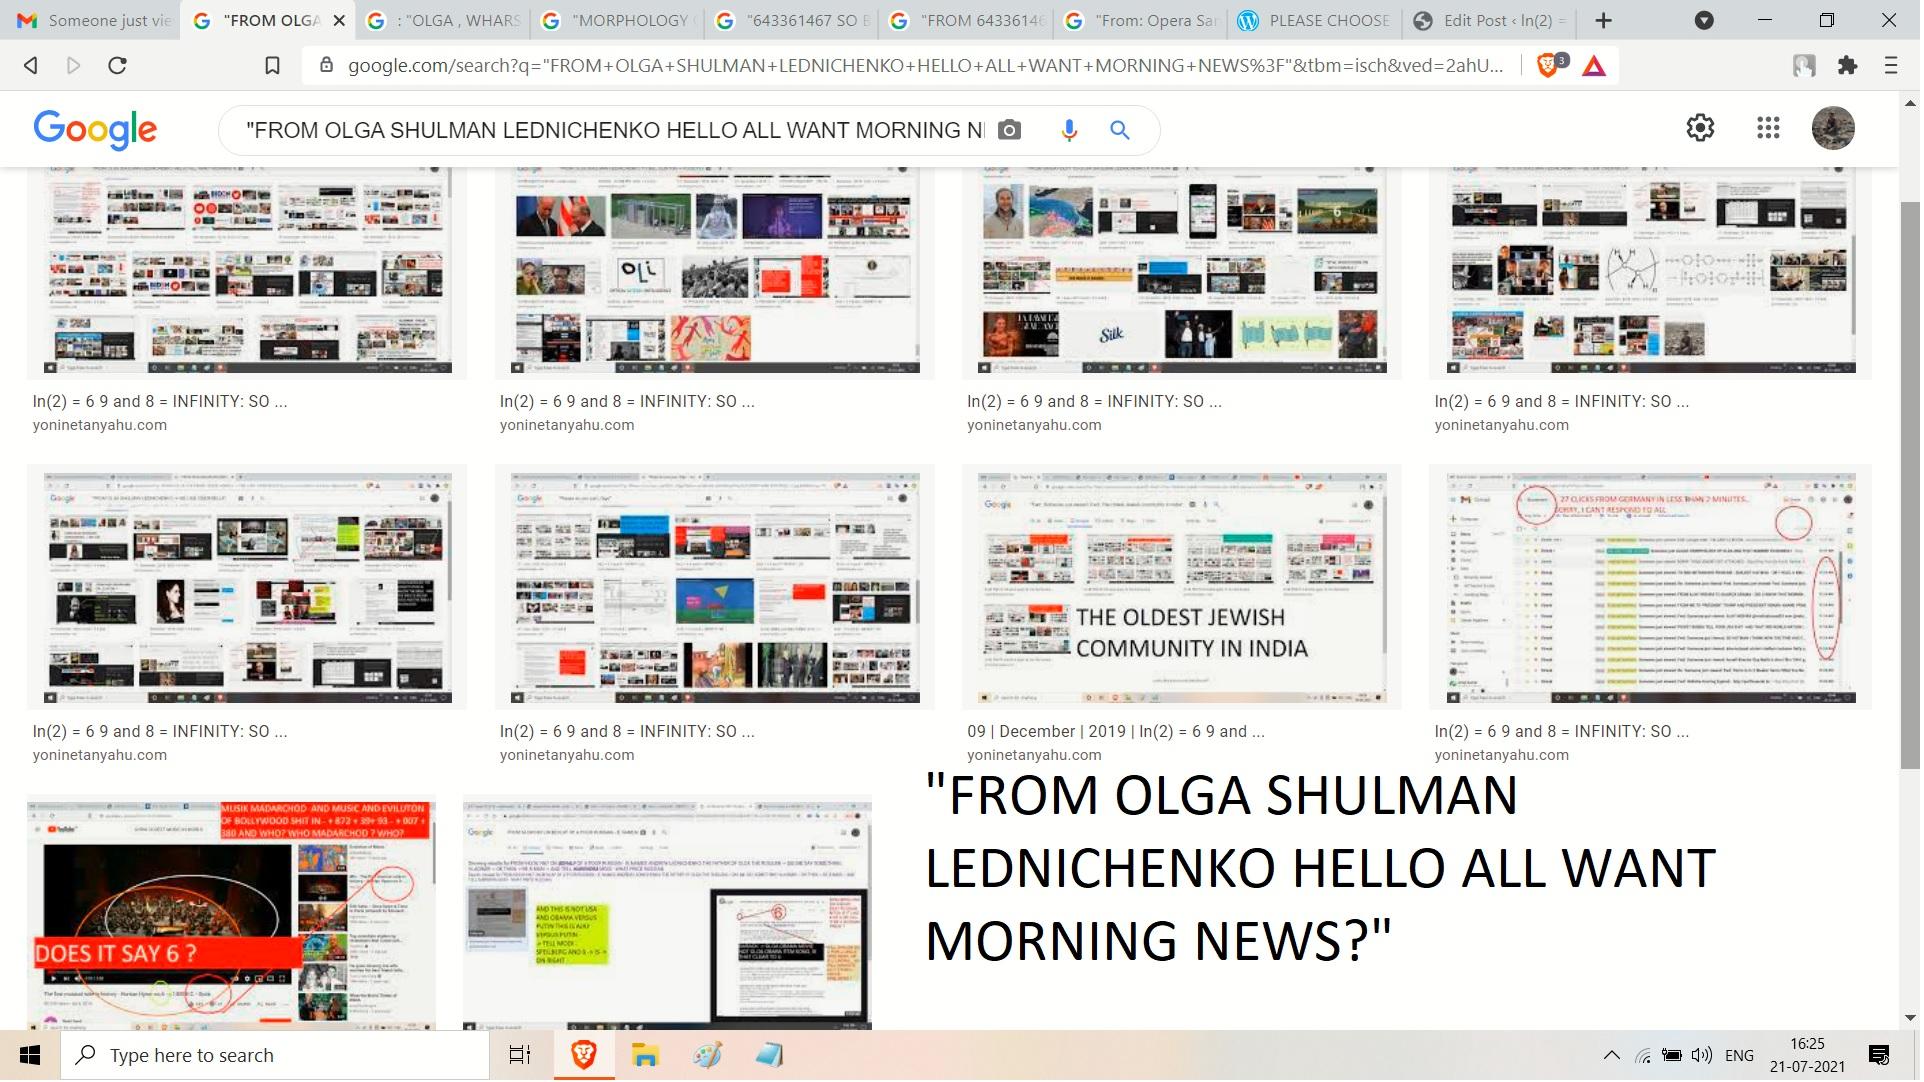 FROM OLGA SHULMAN LEDNICHENKO HELLO ALL WANT MORNING NEWS